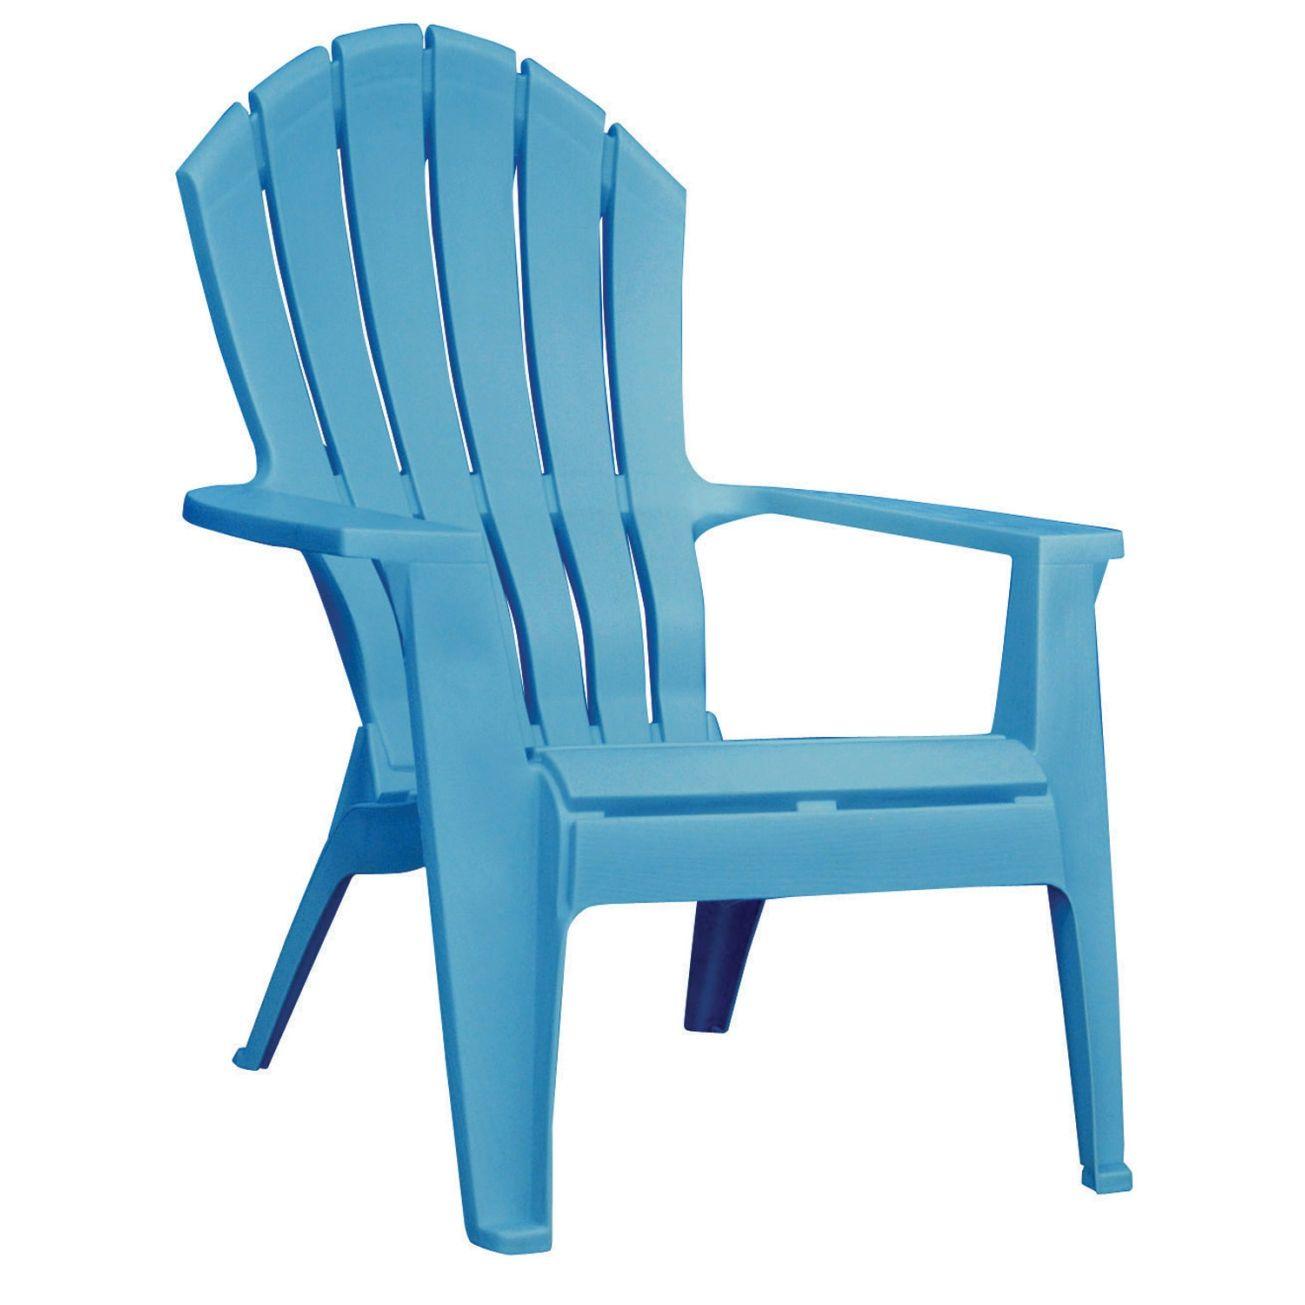 Adams High Back Stacking Ergonomic Adirondack Chair In Pool Blue